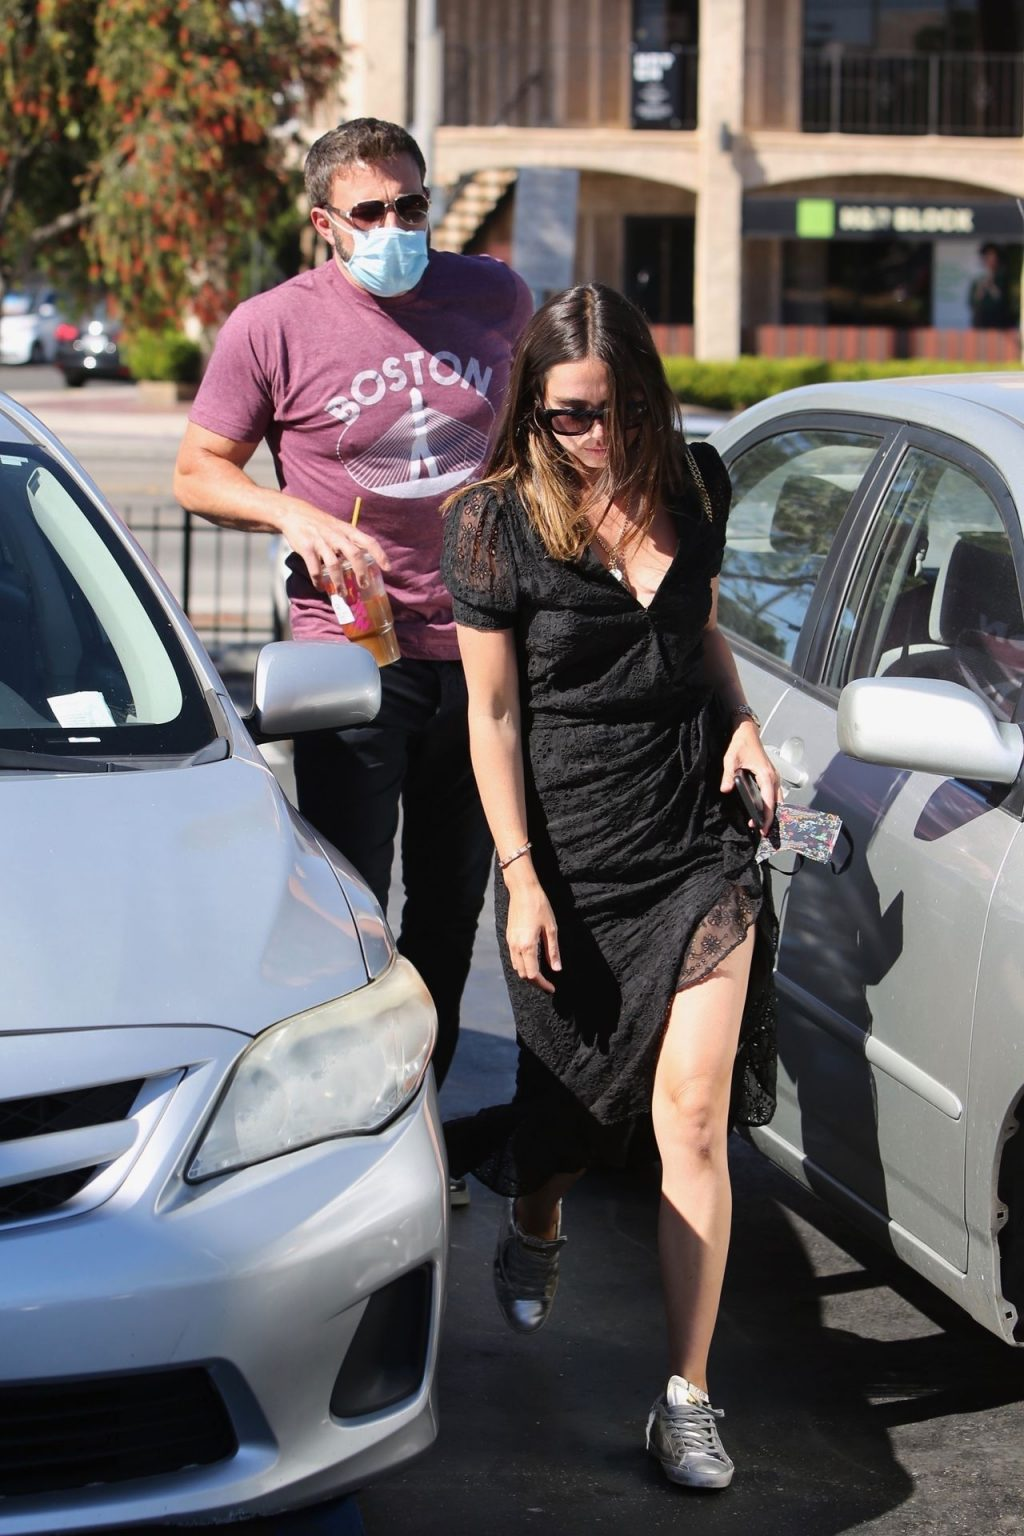 Ben Affleck & Ana de Armas Can't Keep Their Hands Off Each Other While Shopping (65 Photos)